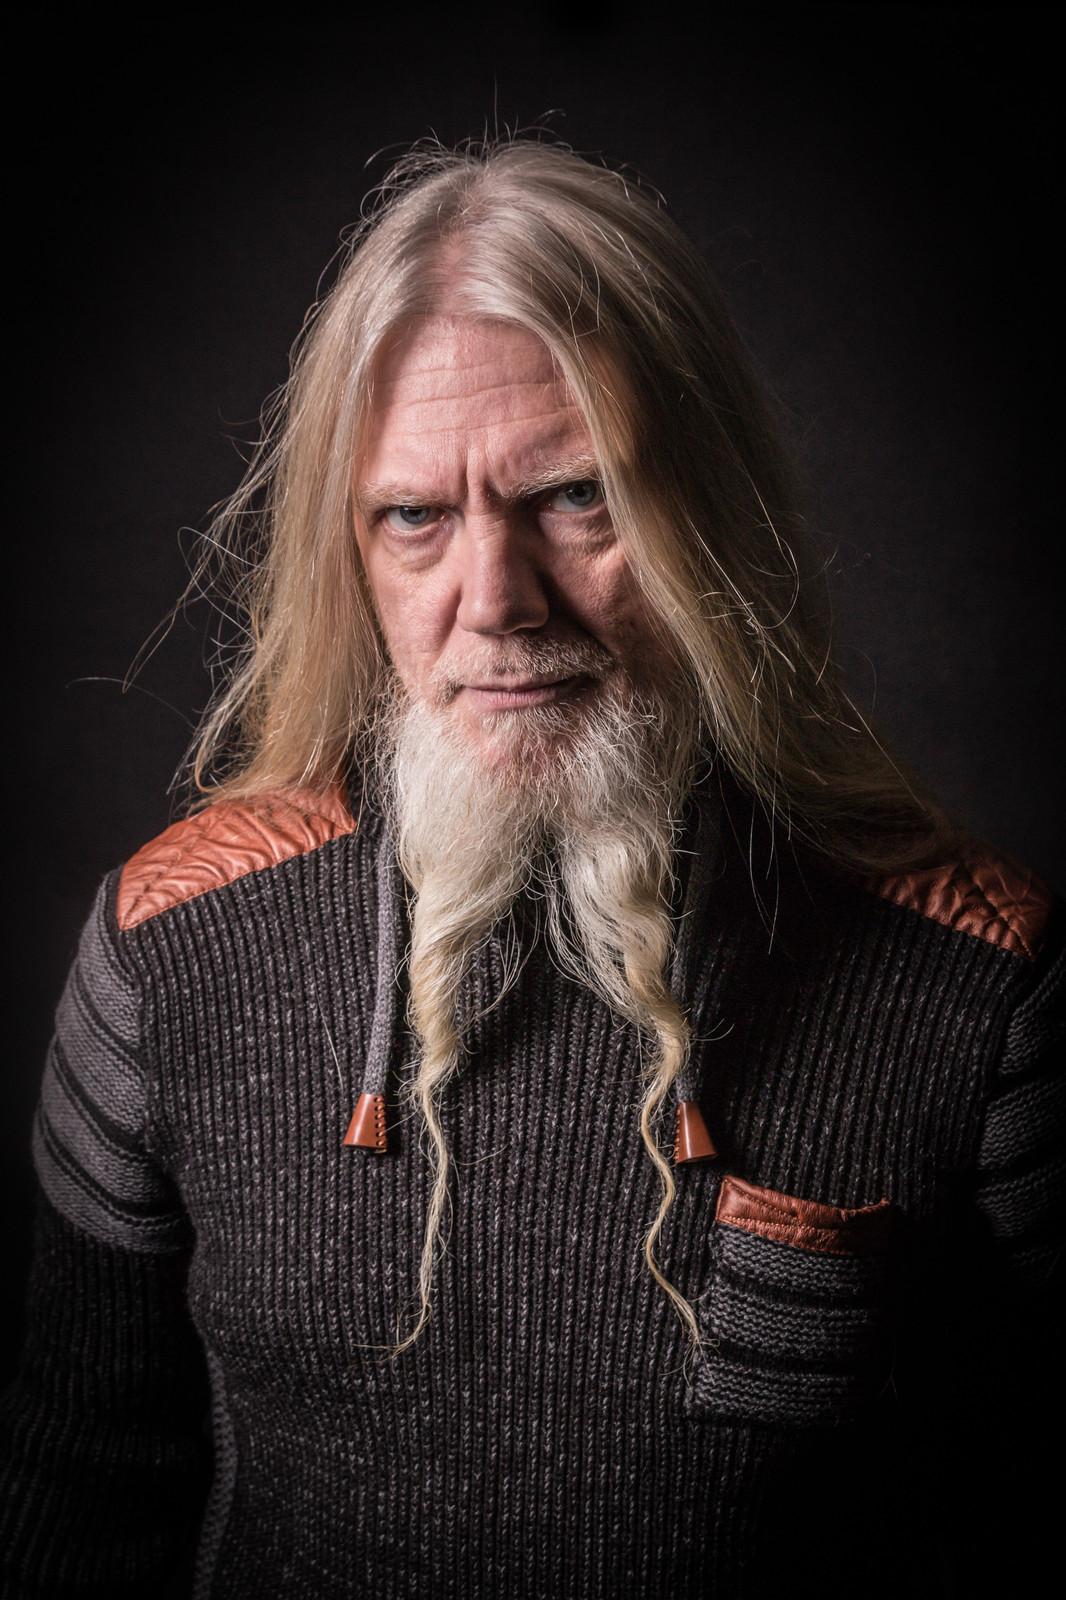 Marco Hietala (Finnish metal musician) - AnthroScape